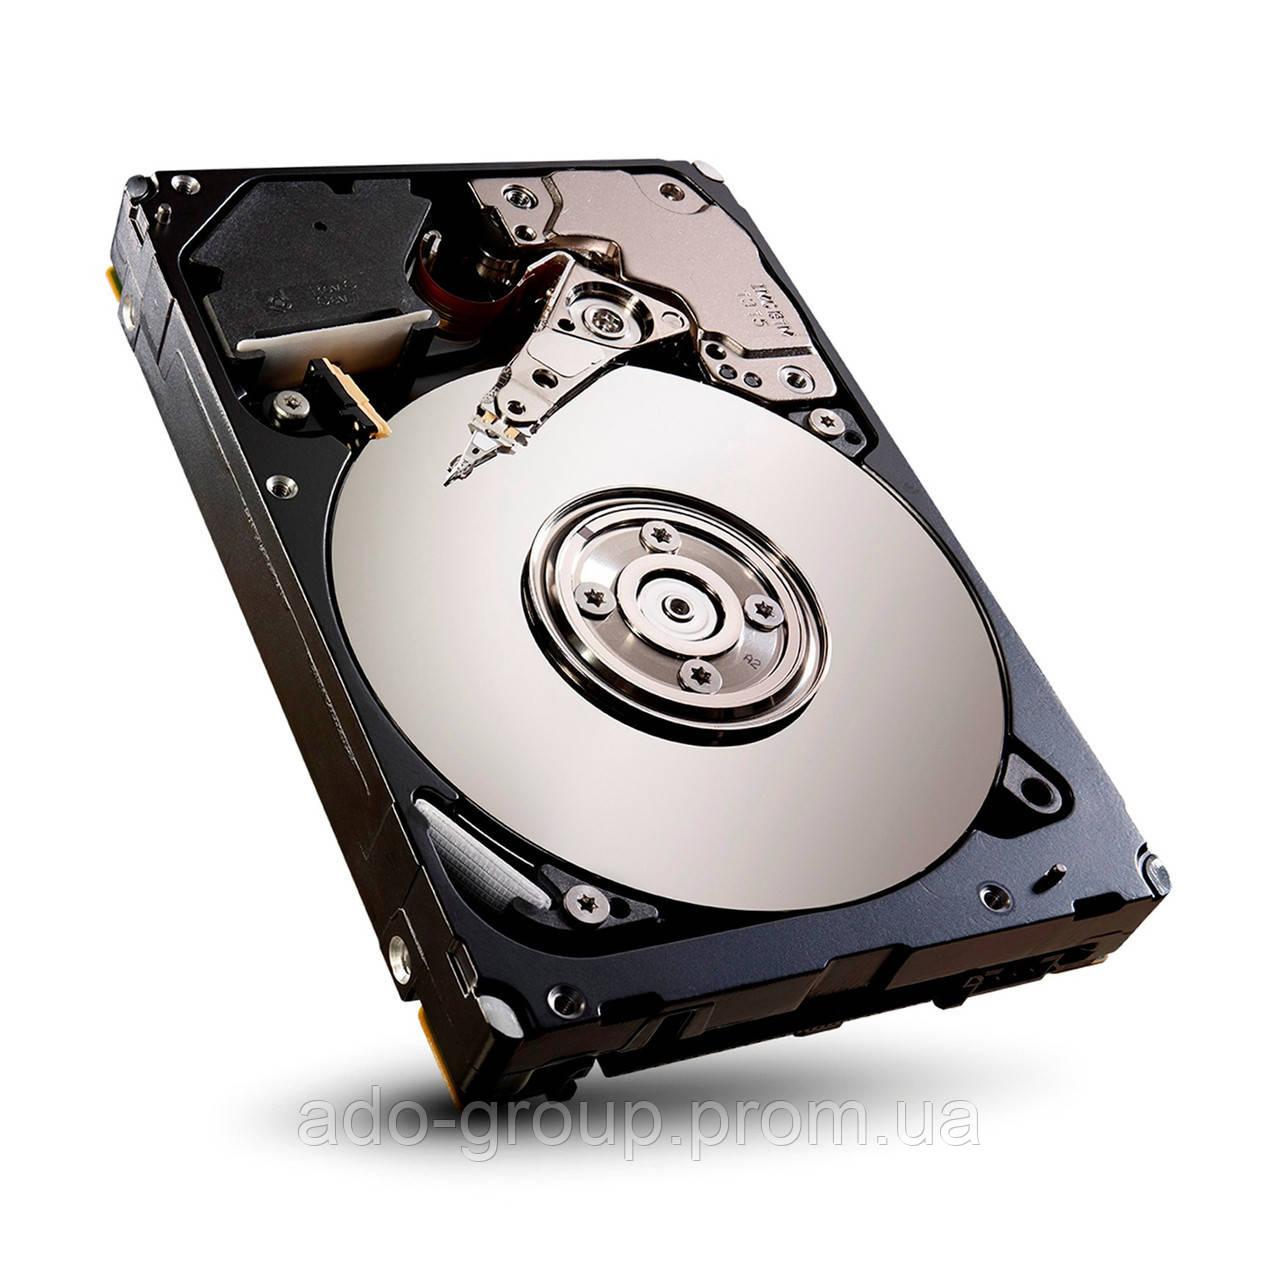 "005050041 Жесткий диск EMC 2000GB SATA 7.2K  3.5"" +"